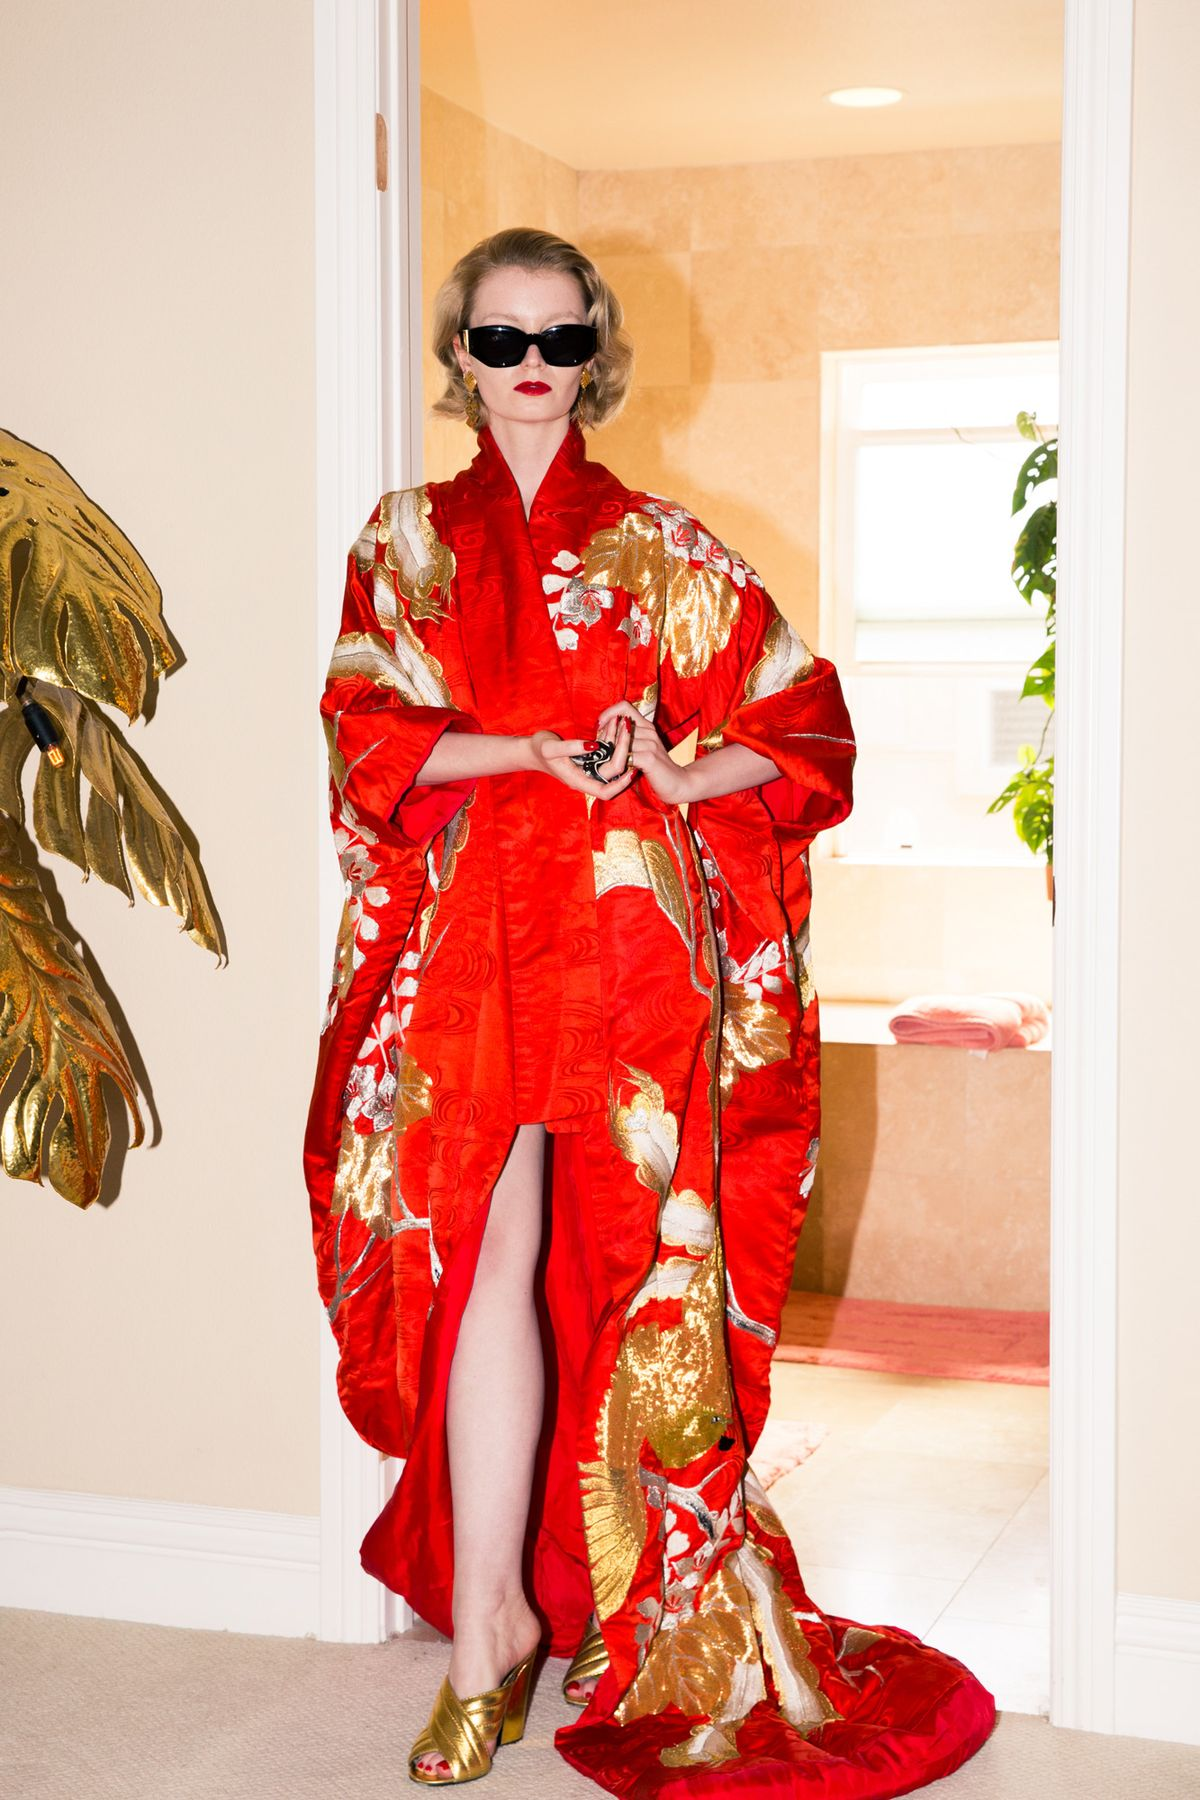 Daisy Donohoe's Wardrobe Is a Straight-Up '80s Beverly Hills Fantasy